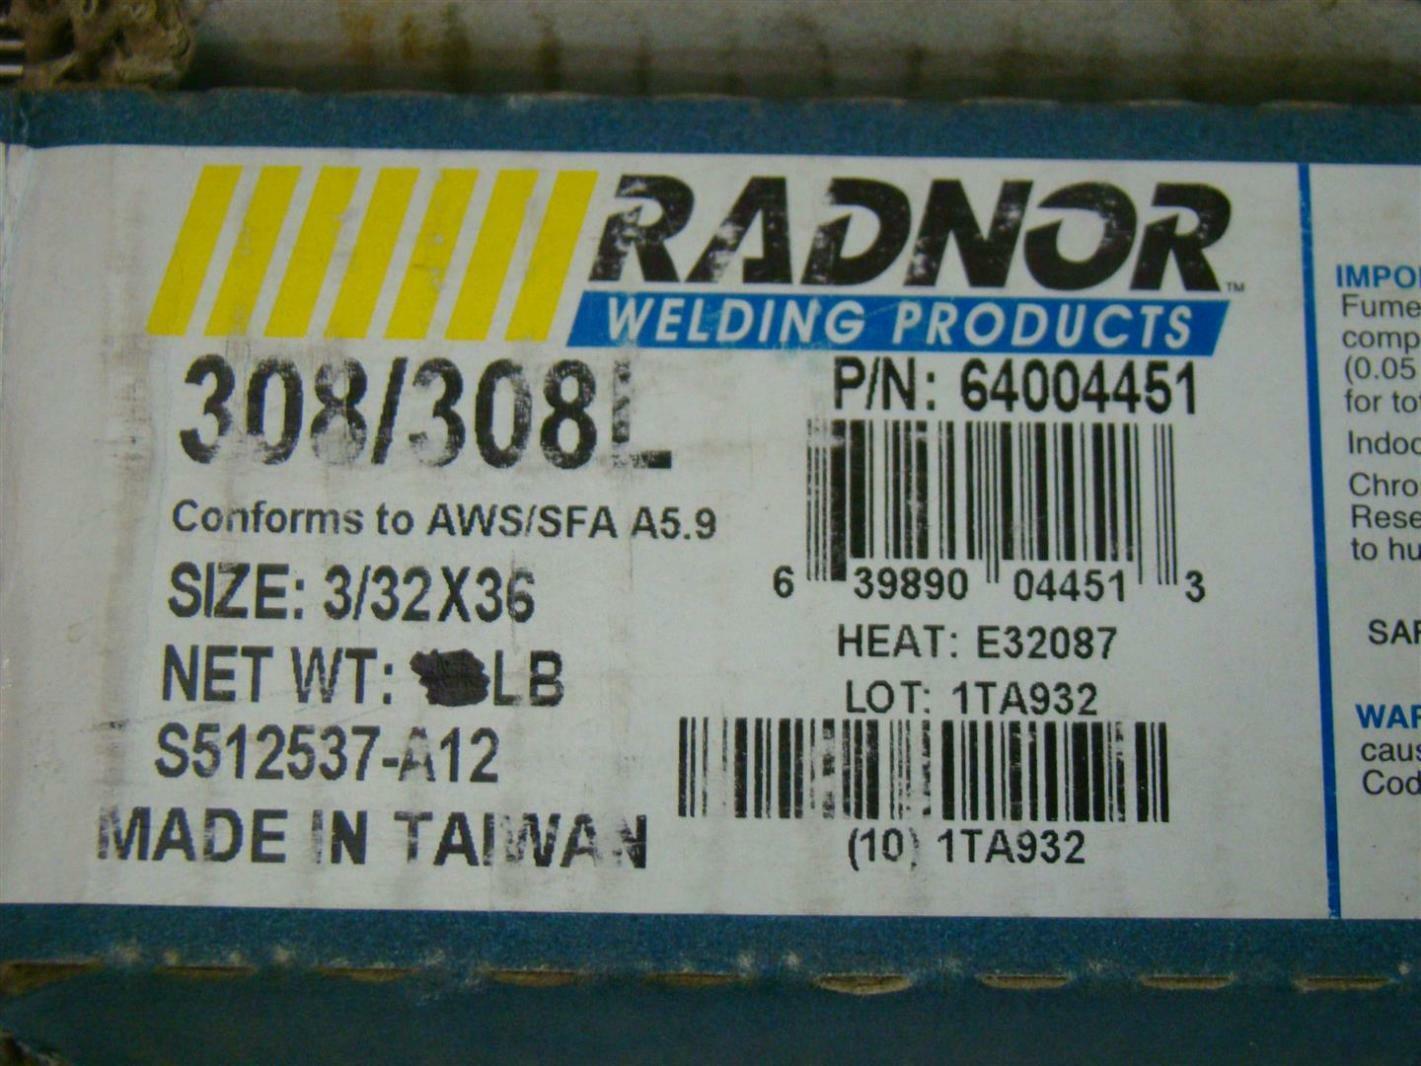 Radnor Welding Products 308/308L 3/32X36 TIG Rod S512537-A12 ...